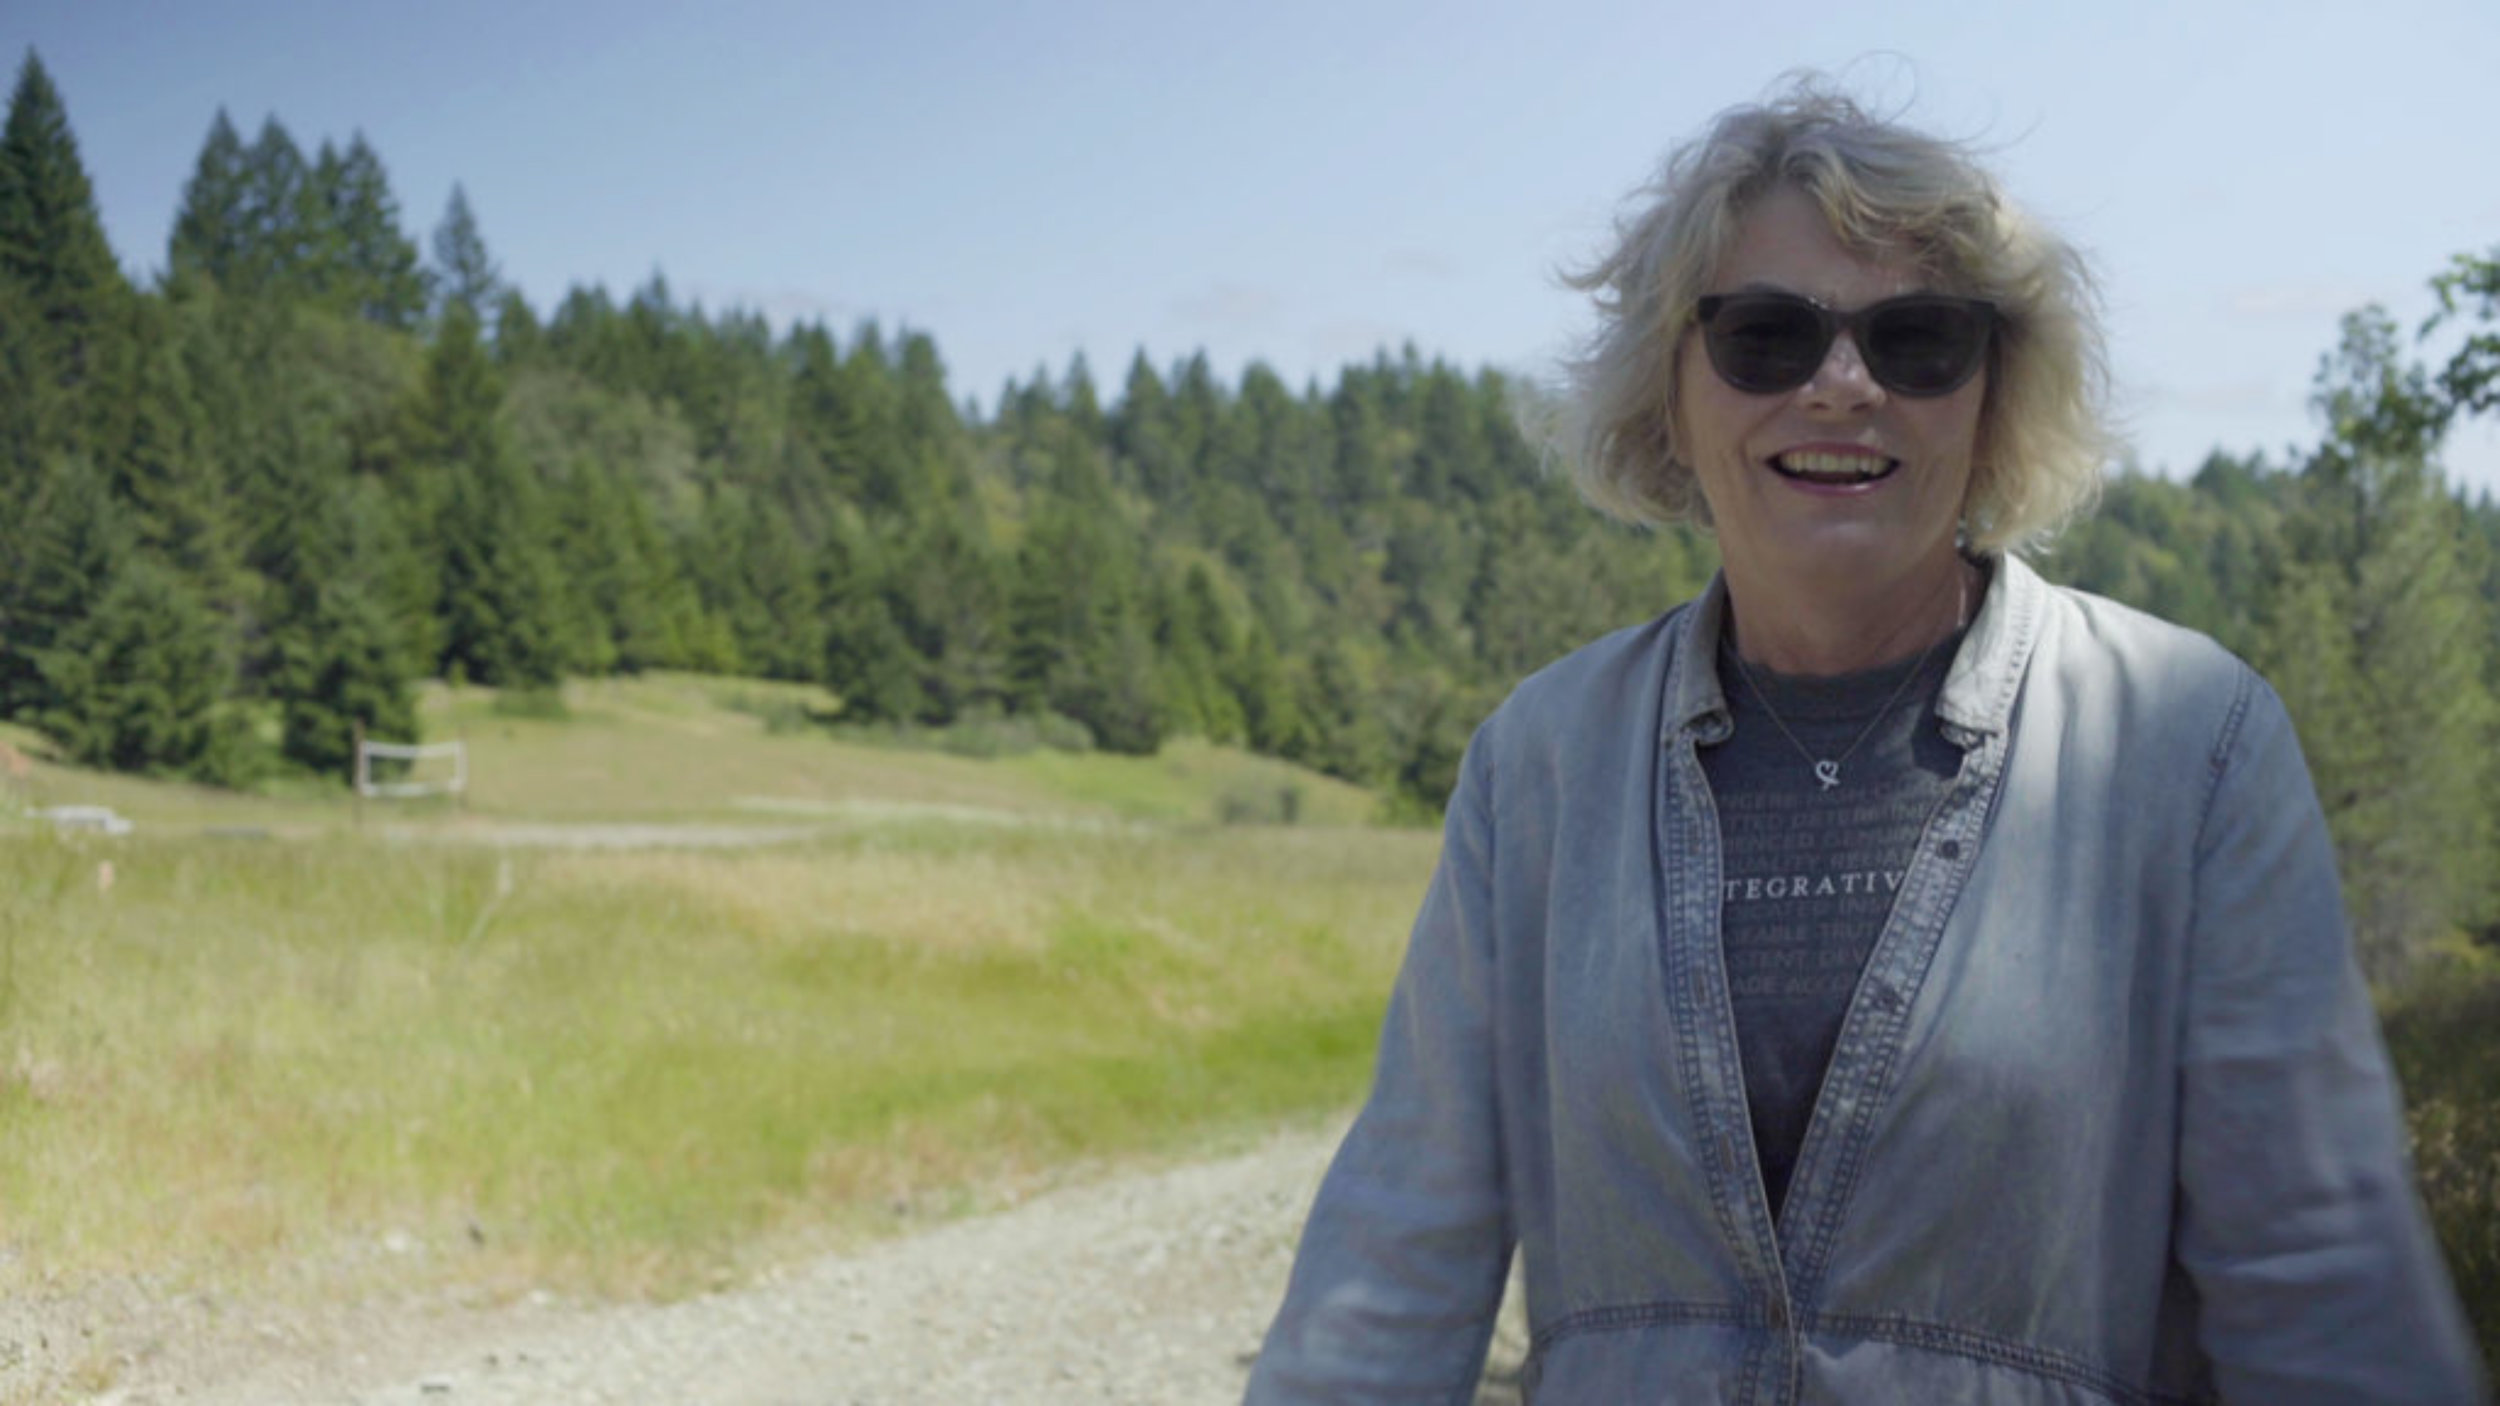 Karyn Wagner - The Brains and Heart Behind BYOB